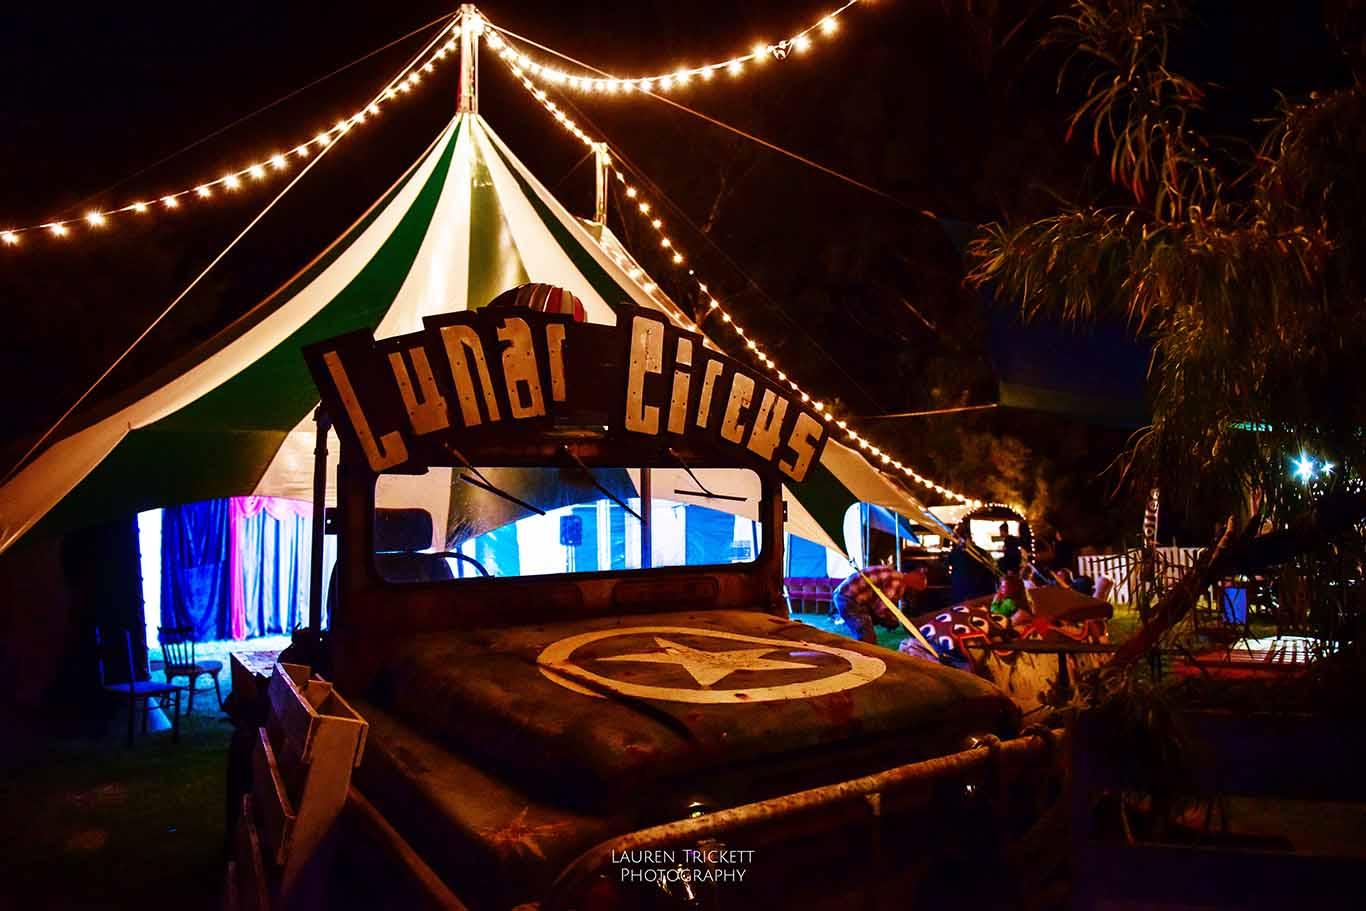 lunar patrol wagon at Karnidale Festival - Lunar Circus, Australia